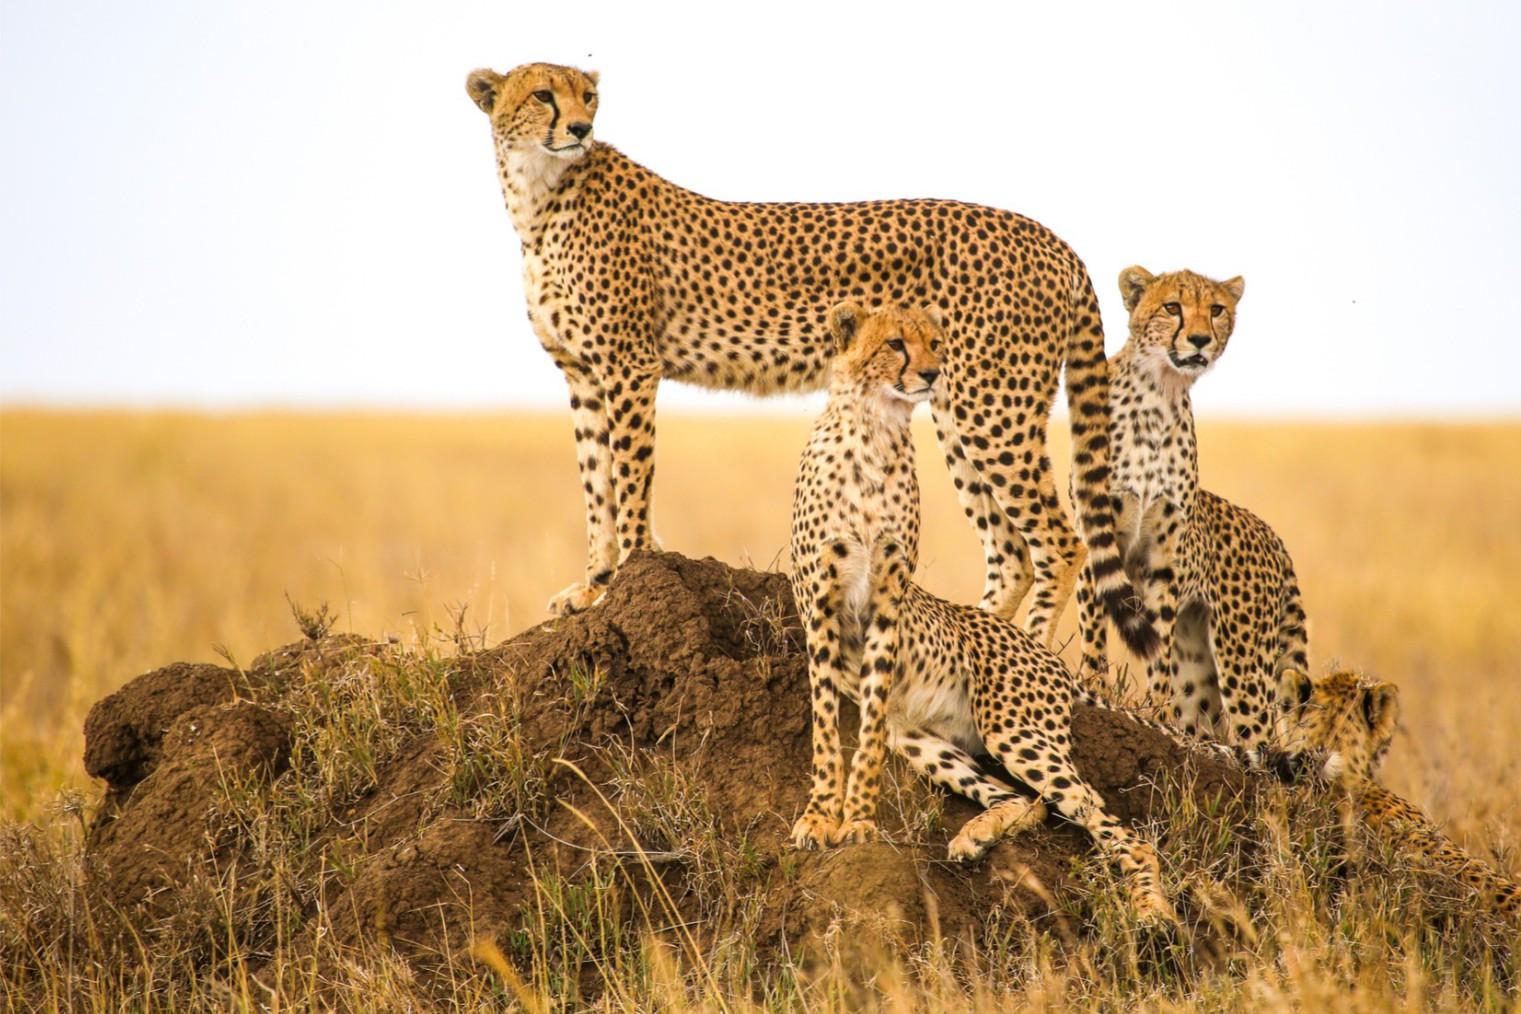 Serengeti, Tanzania. Travel. Серенгети. Туризм